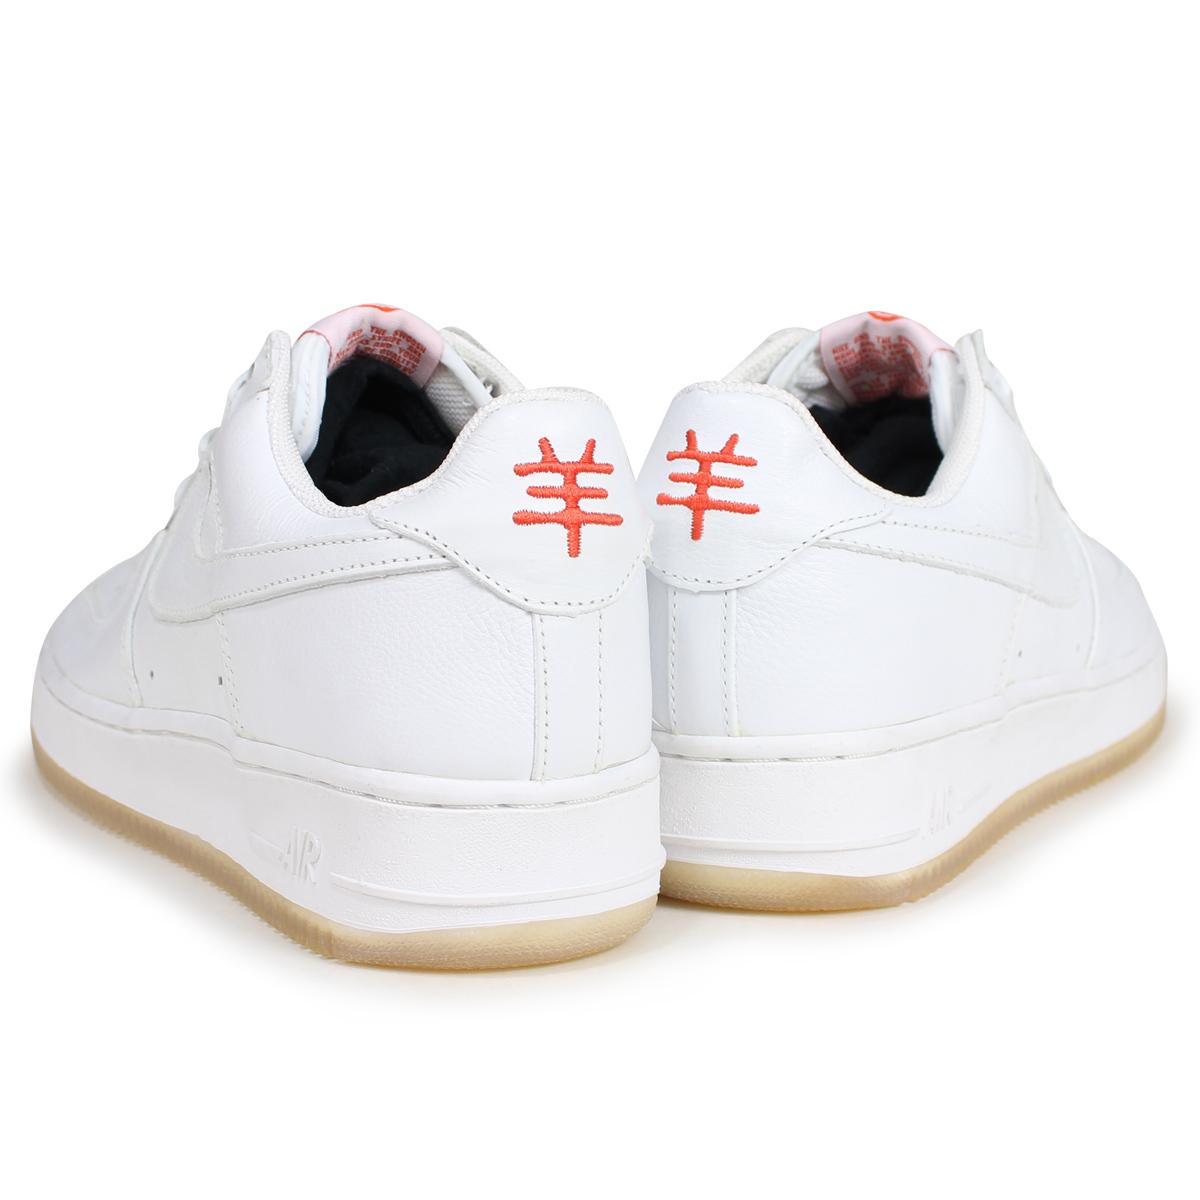 97b0aebf76fe5 NIKE AIR FORCE 1 LOW YEAR OF SHEEP Nike air force 1 sneakers men 306